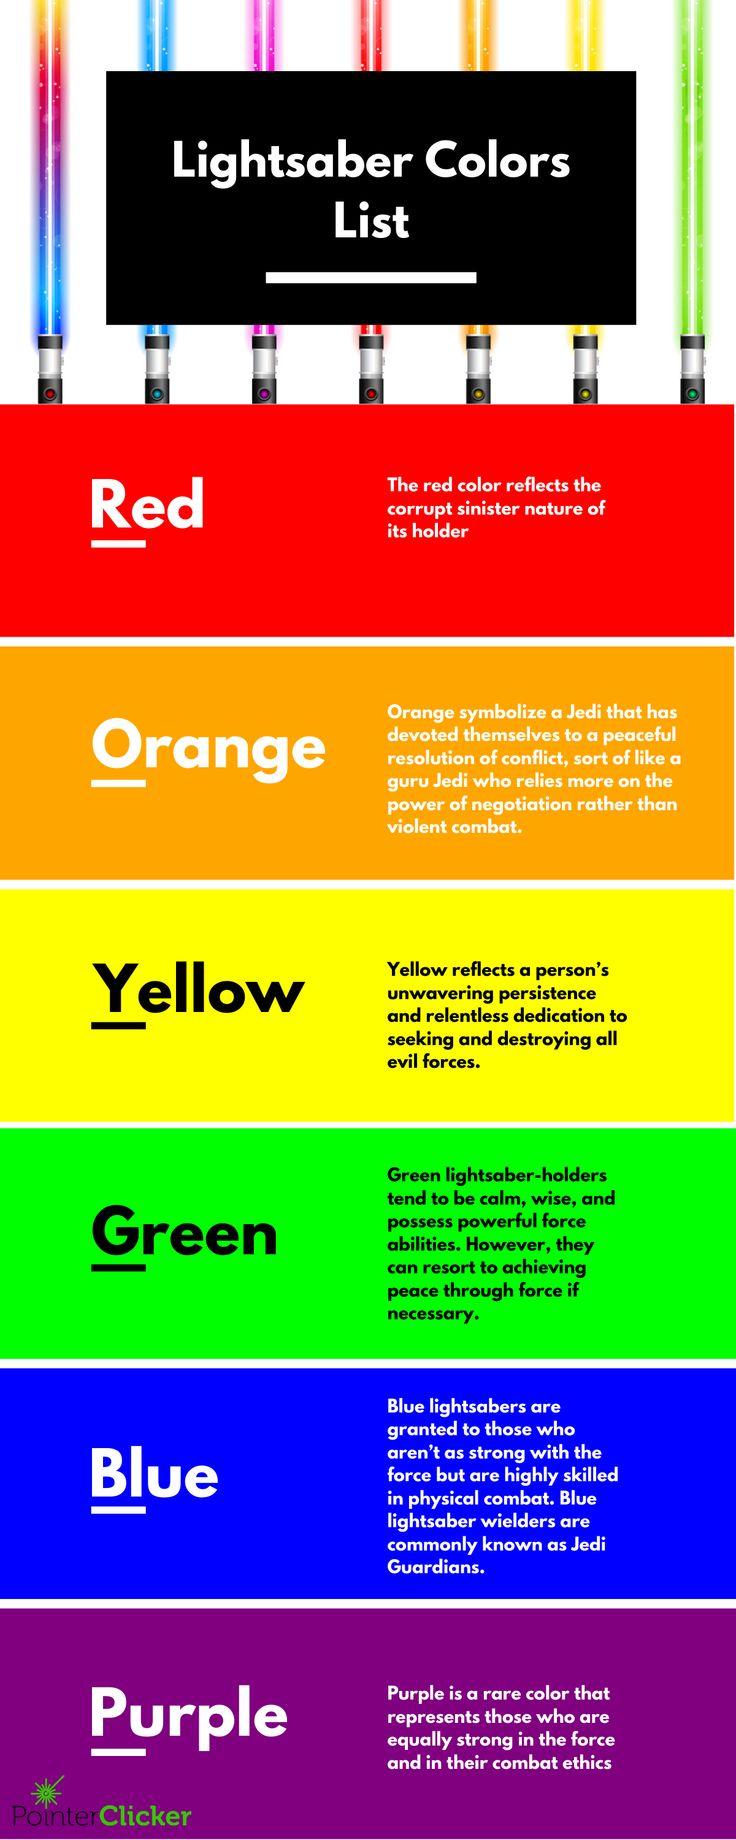 Lightsaber Color Meaning: What Lightsaber Color Am I? in ...